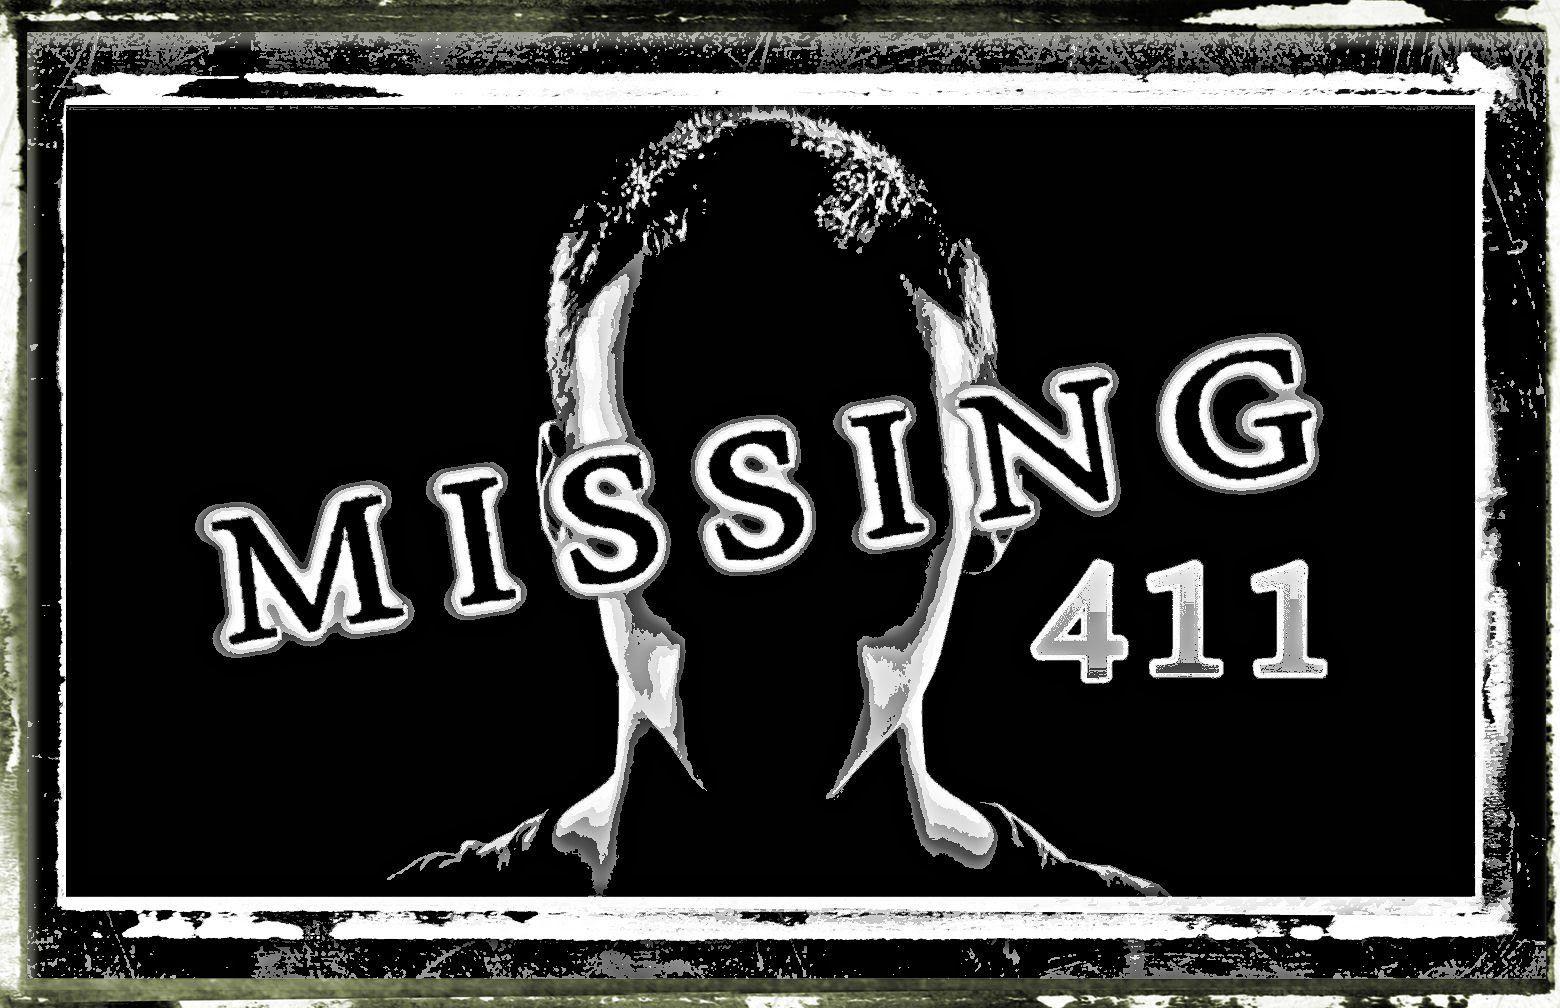 STRANGE CASES OF MISSING PEOPLE 411 (2015)